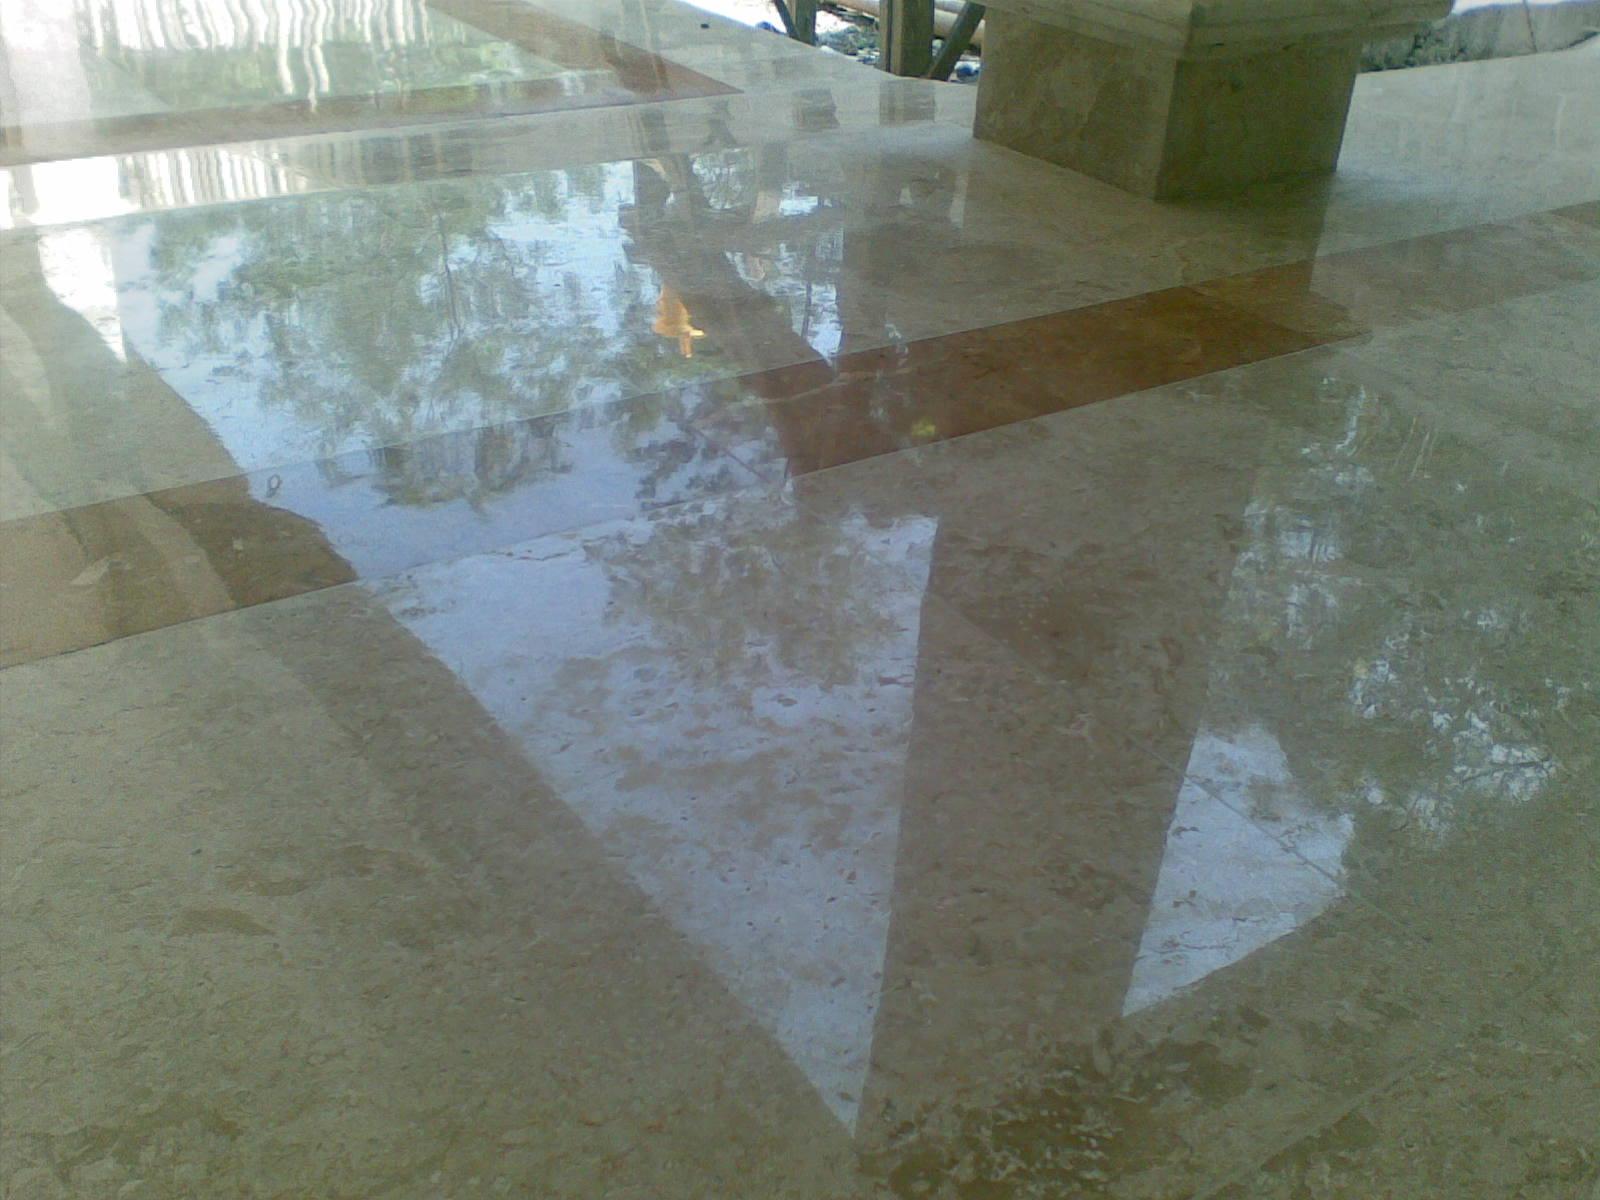 macam motif tegel melayani pemasang an lantai segala macam jenis